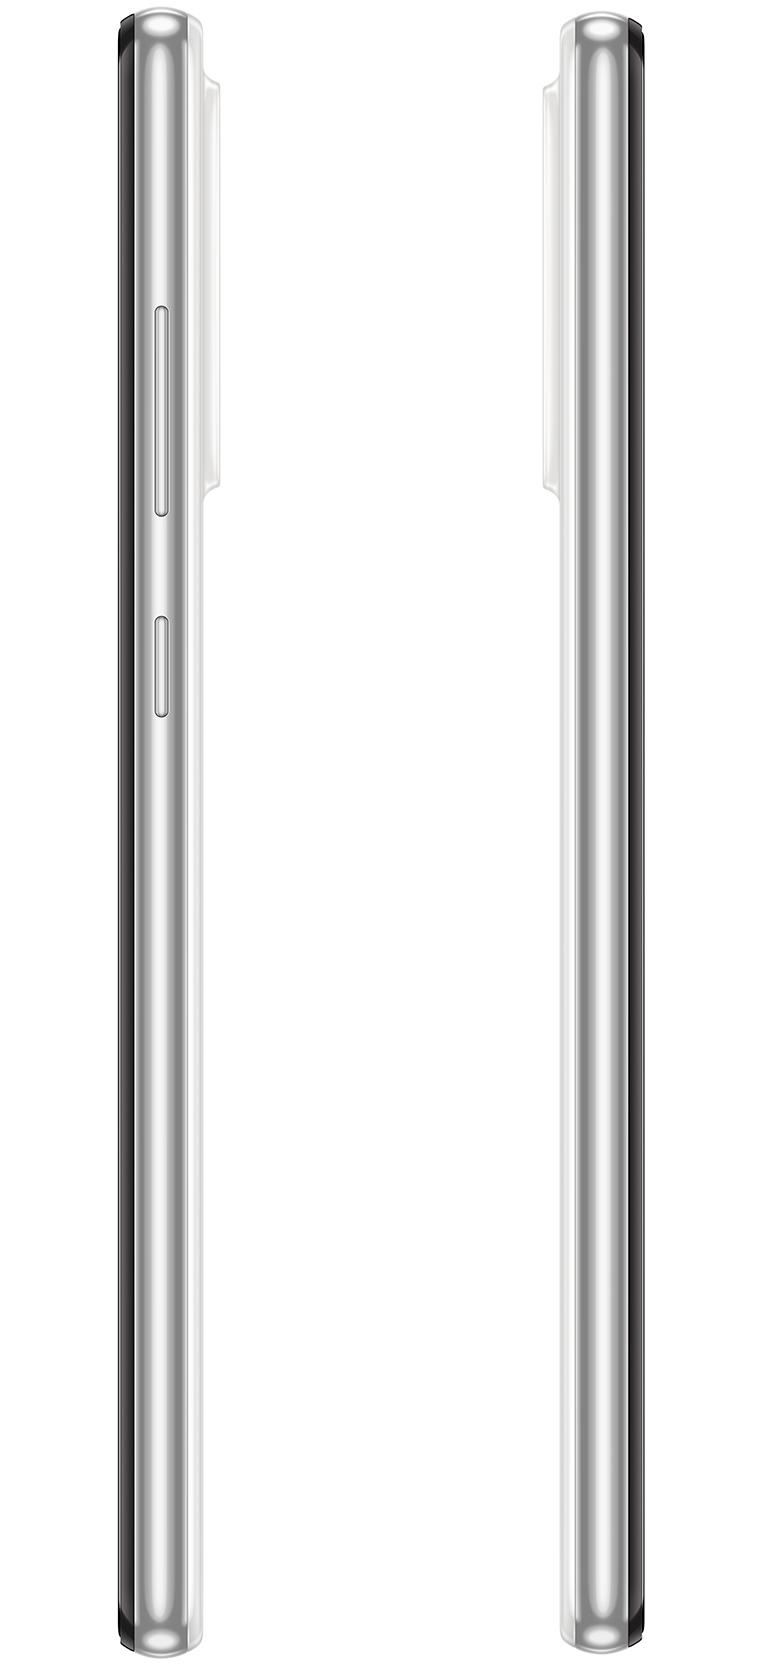 Samsung Galaxy A72 DS (SM-A725) 256GB White - 5